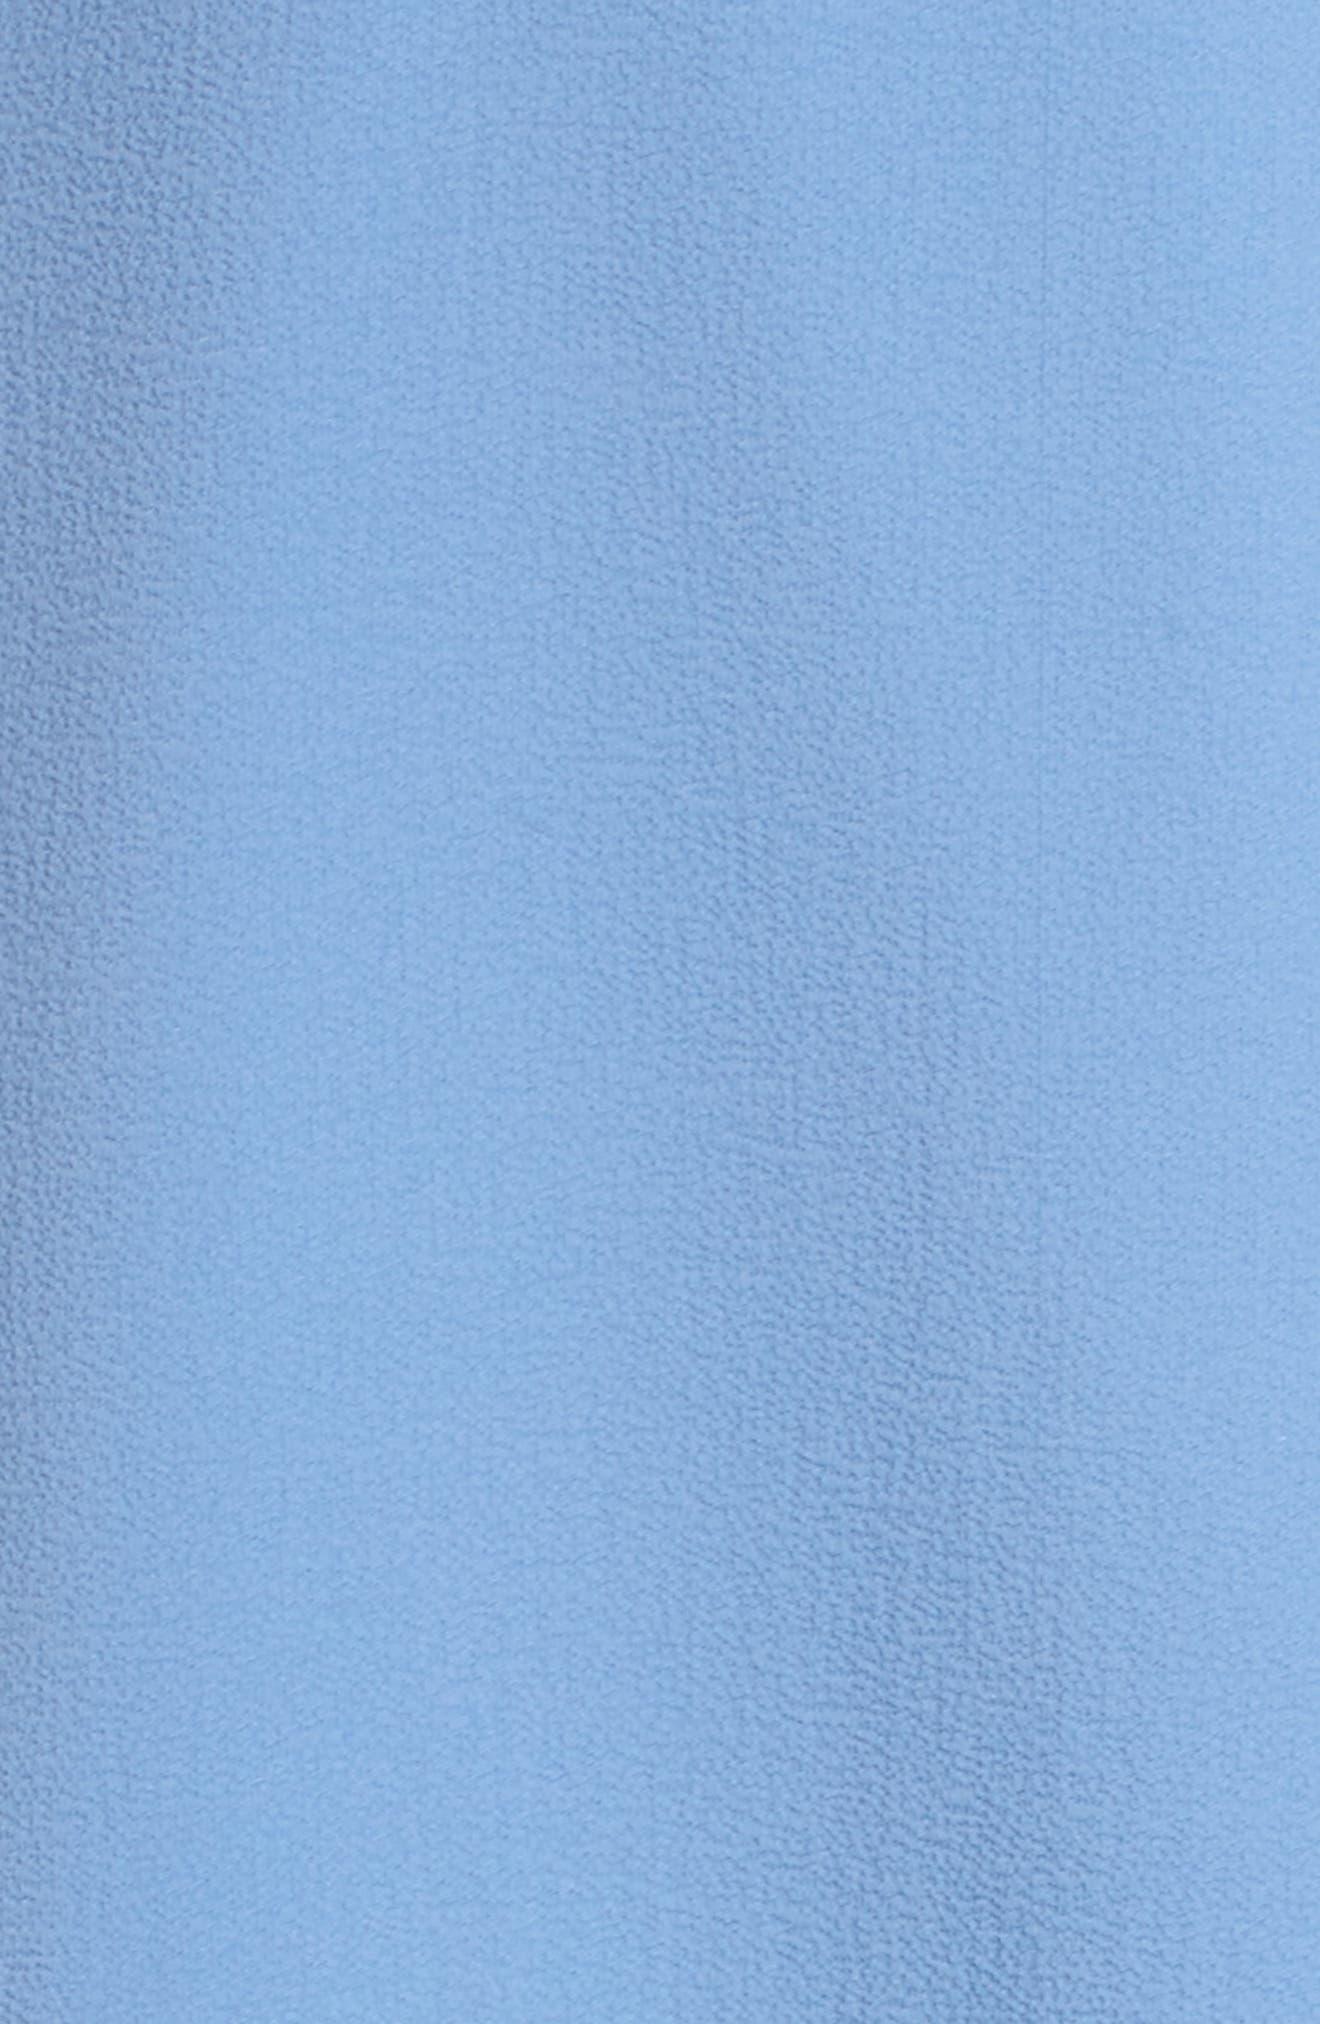 Lauryl Wrap Dress,                             Alternate thumbnail 5, color,                             450